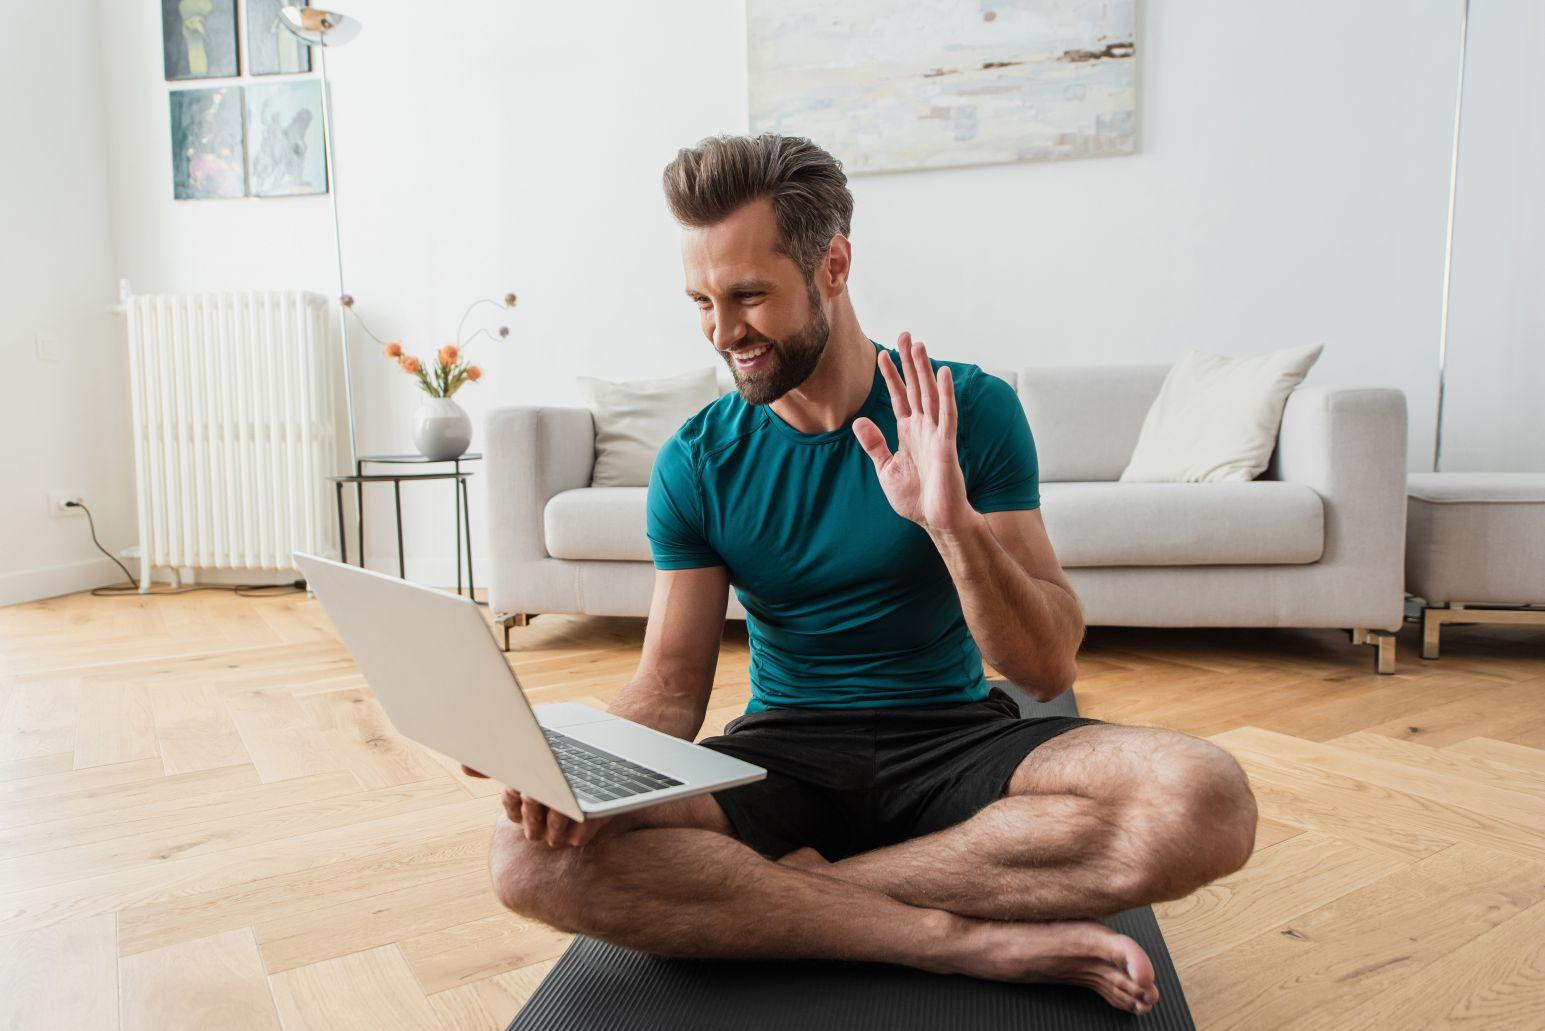 Online Yoga YTT Student Smiling With Laptop